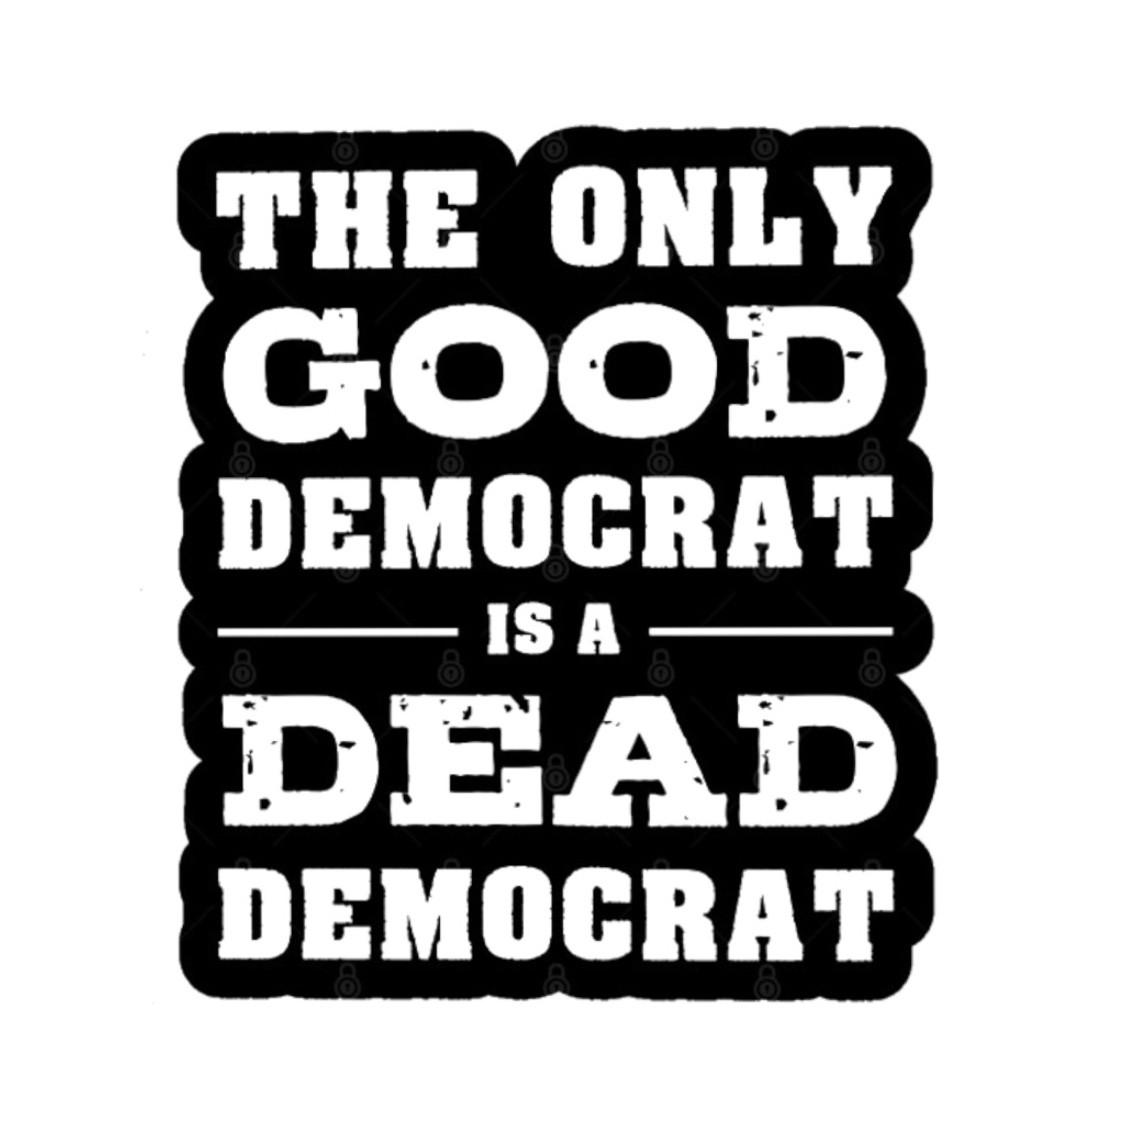 The Only Good Democrat is a Dead Democrat